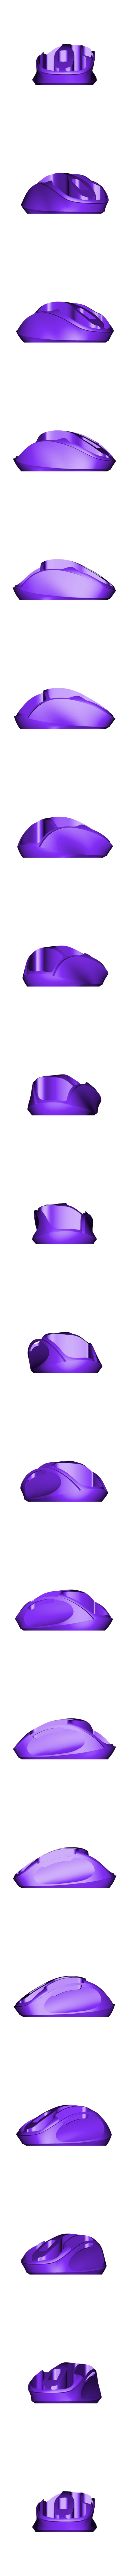 azuro_base.stl Download free STL file Azuro Computer Mouse • 3D printer model, MaxMKA